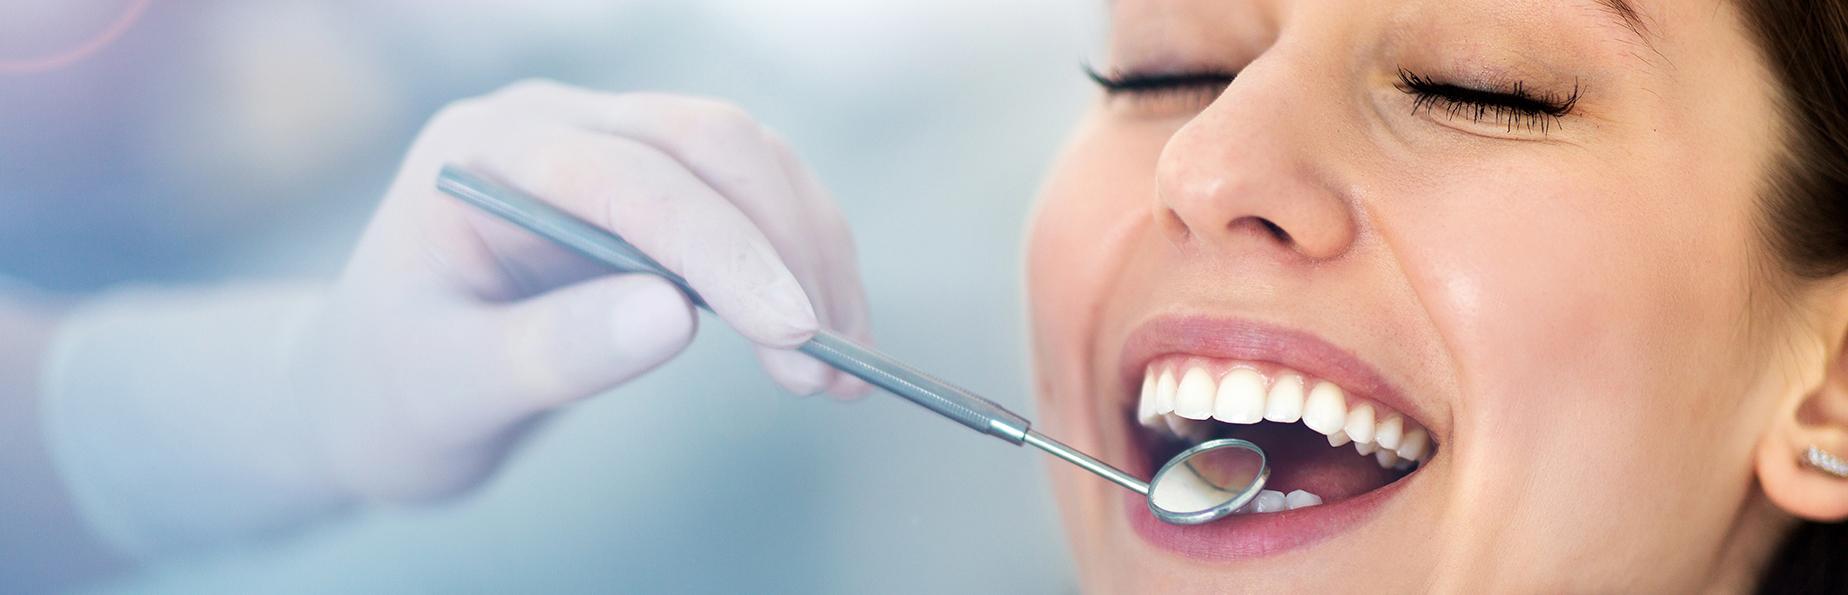 Clinica Bustillo: Odontología